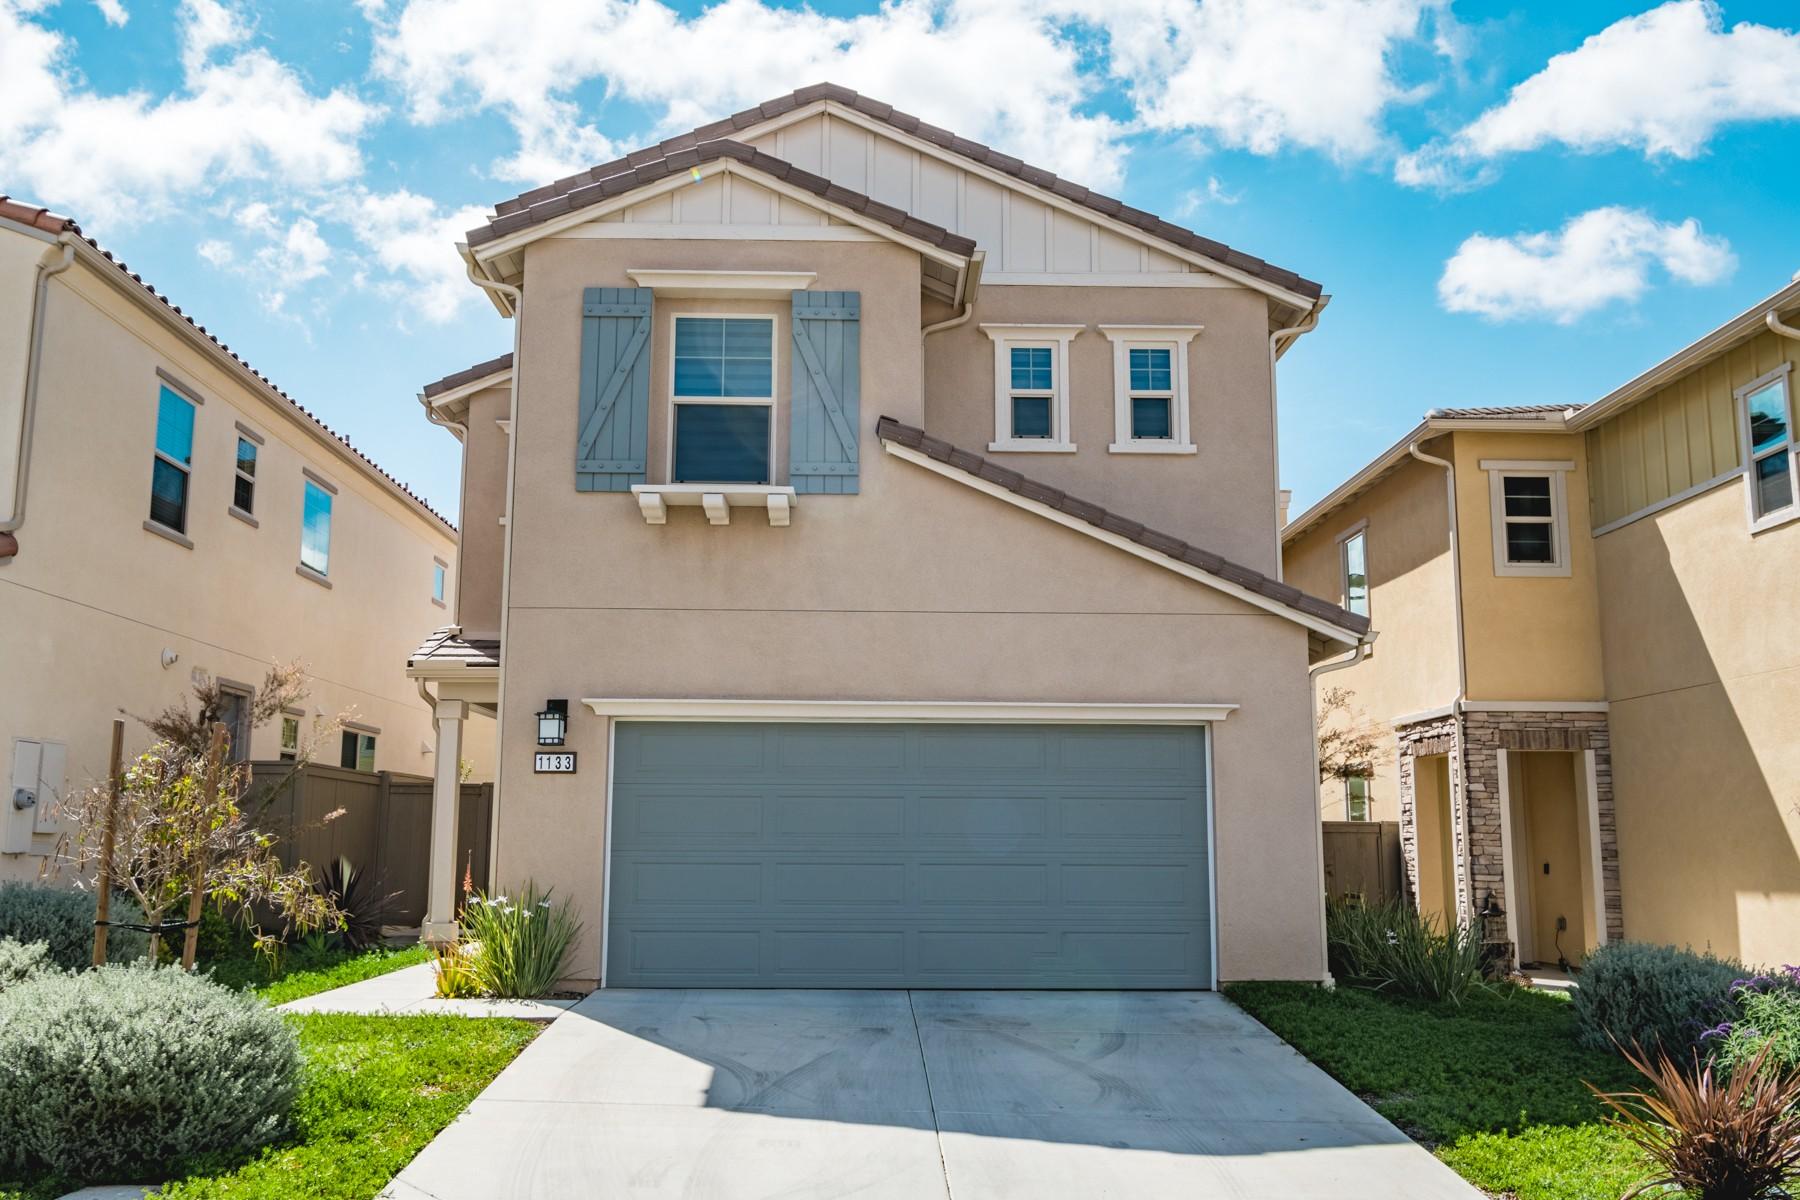 Single Family Home for Active at 1133 Savanna Lane 1133 Savanna Ln Vista, California 92084 United States